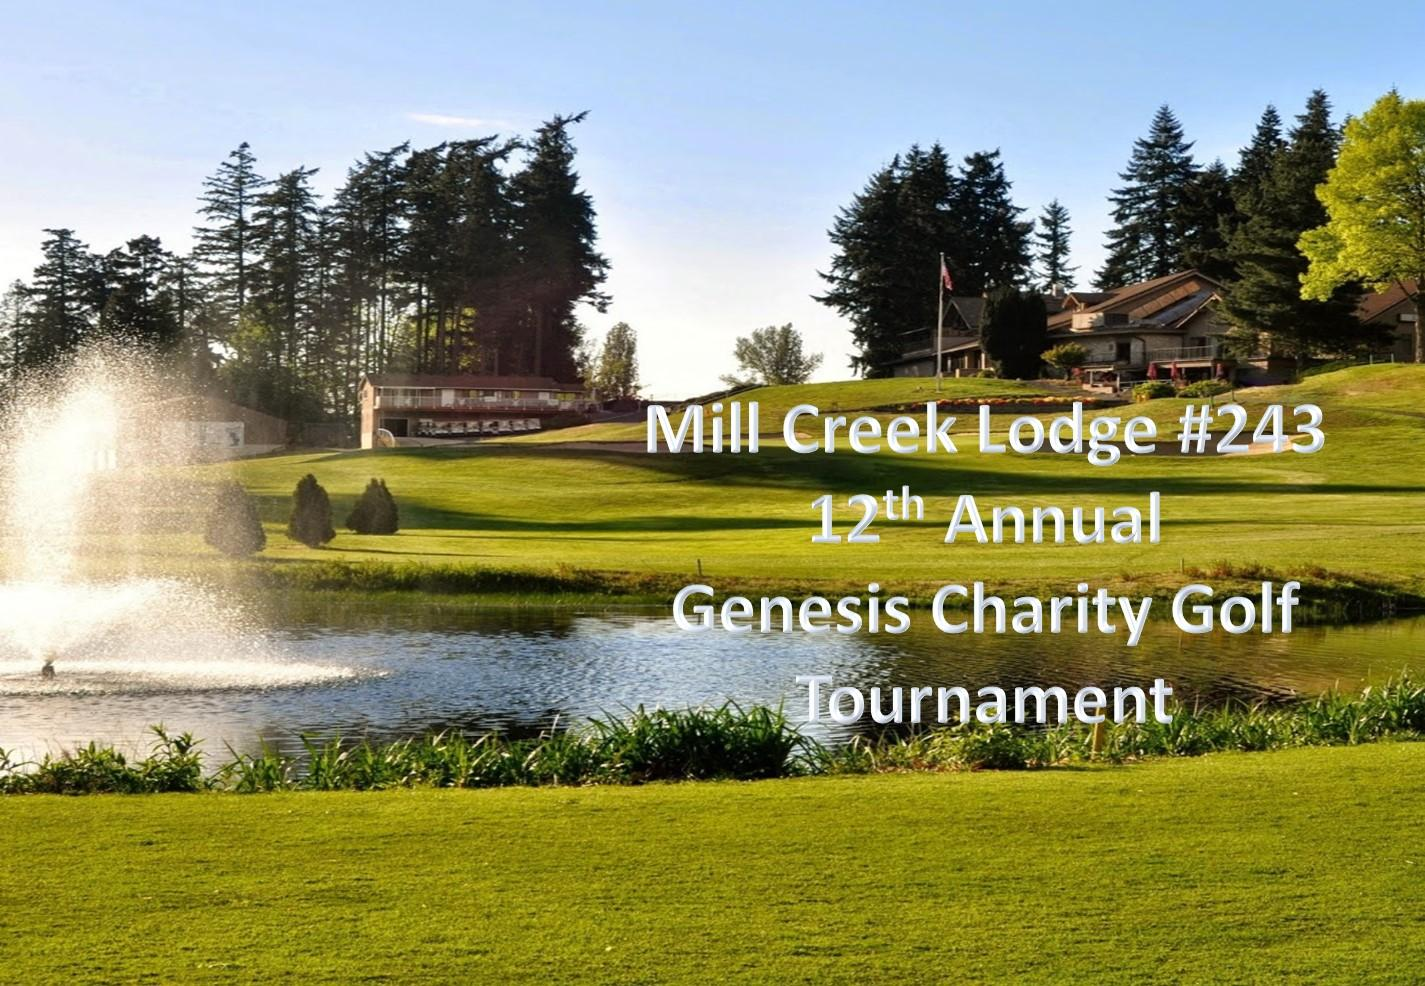 12th Annual Genesis Charity Golf Tournament